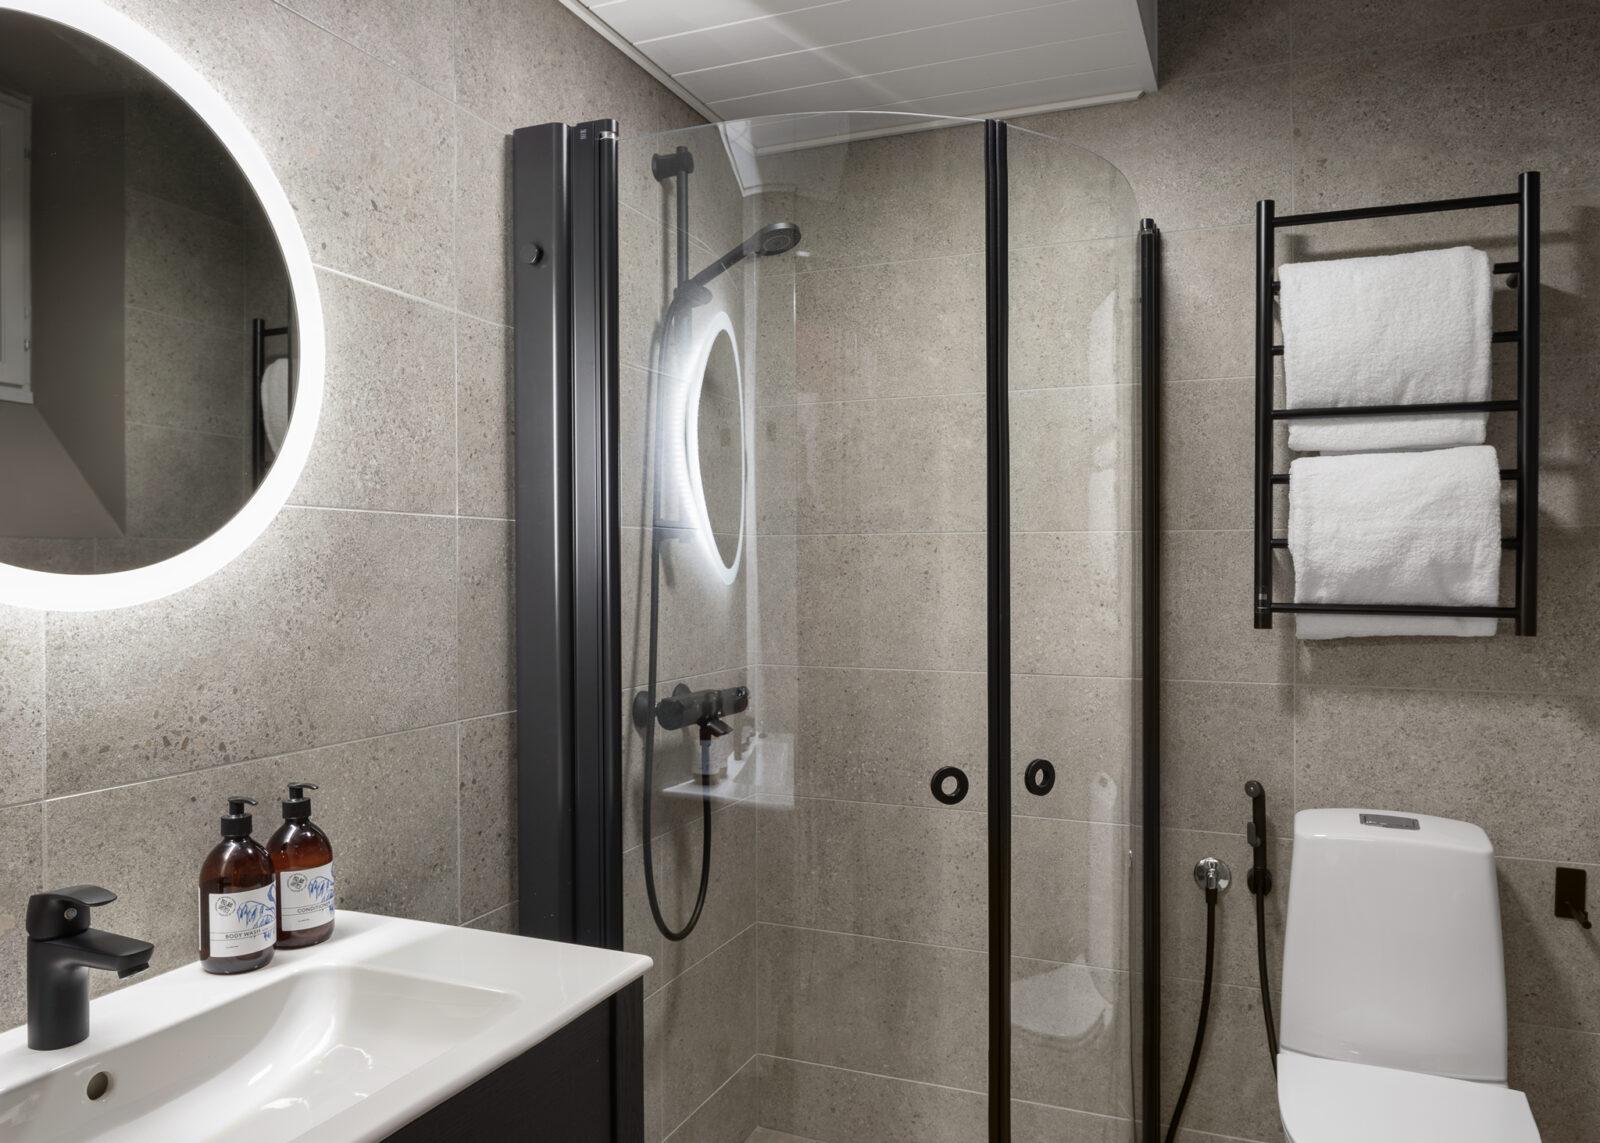 Standard-huone WC